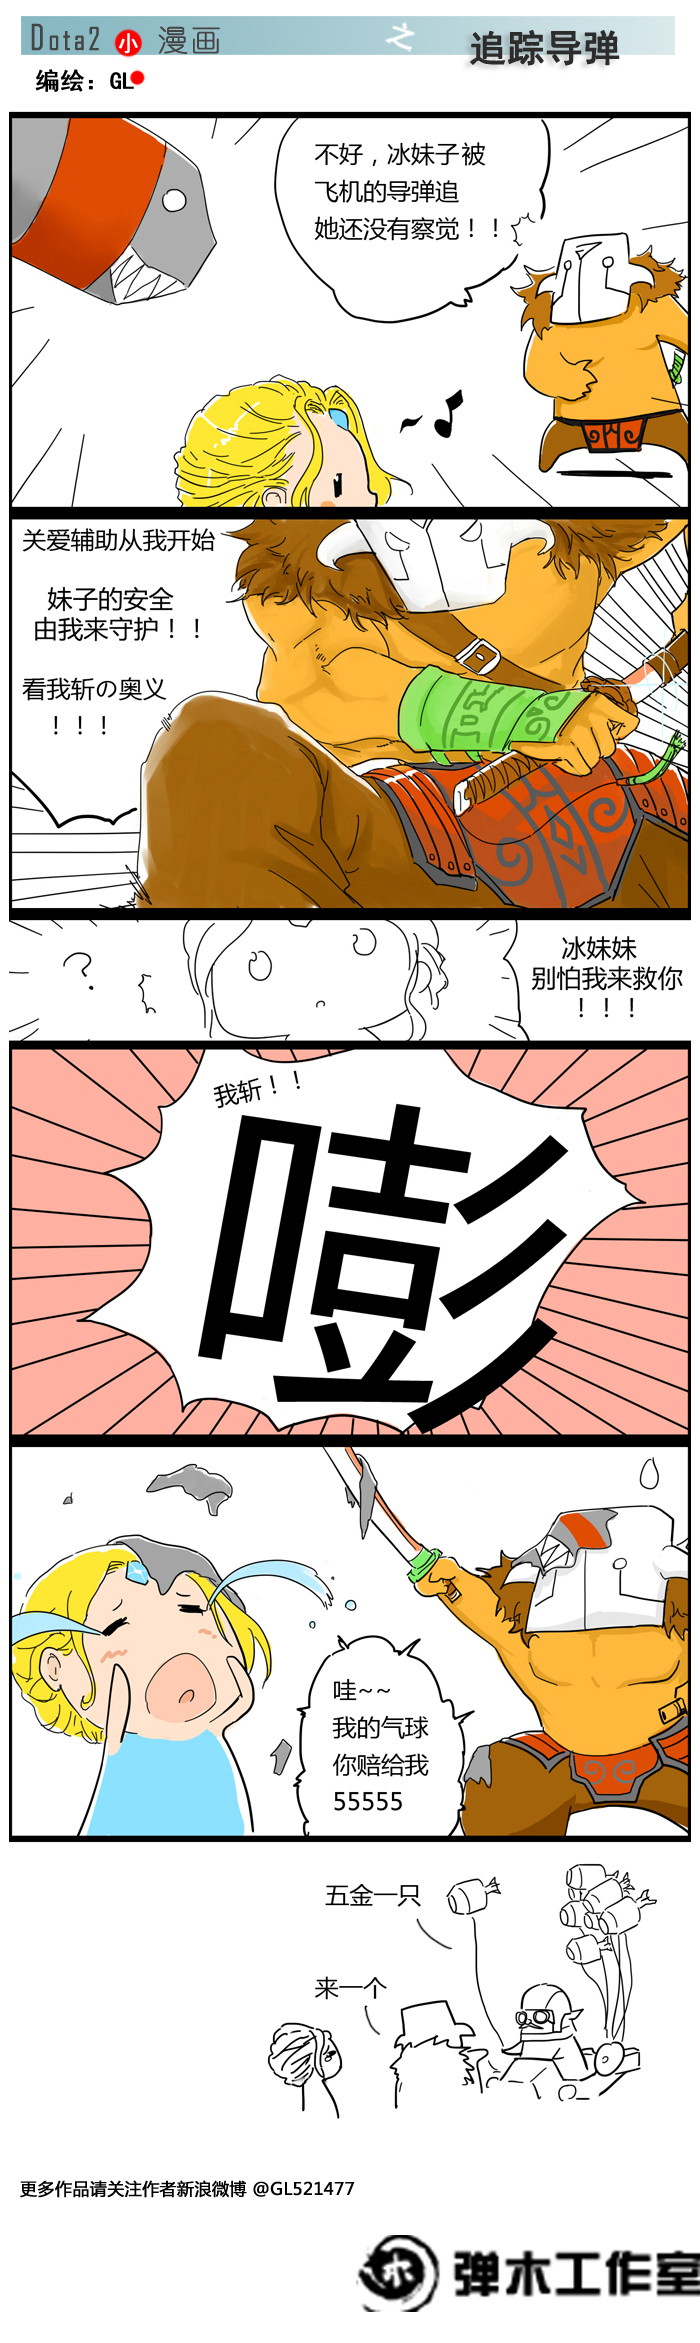 dota2矮人直升机四格漫画